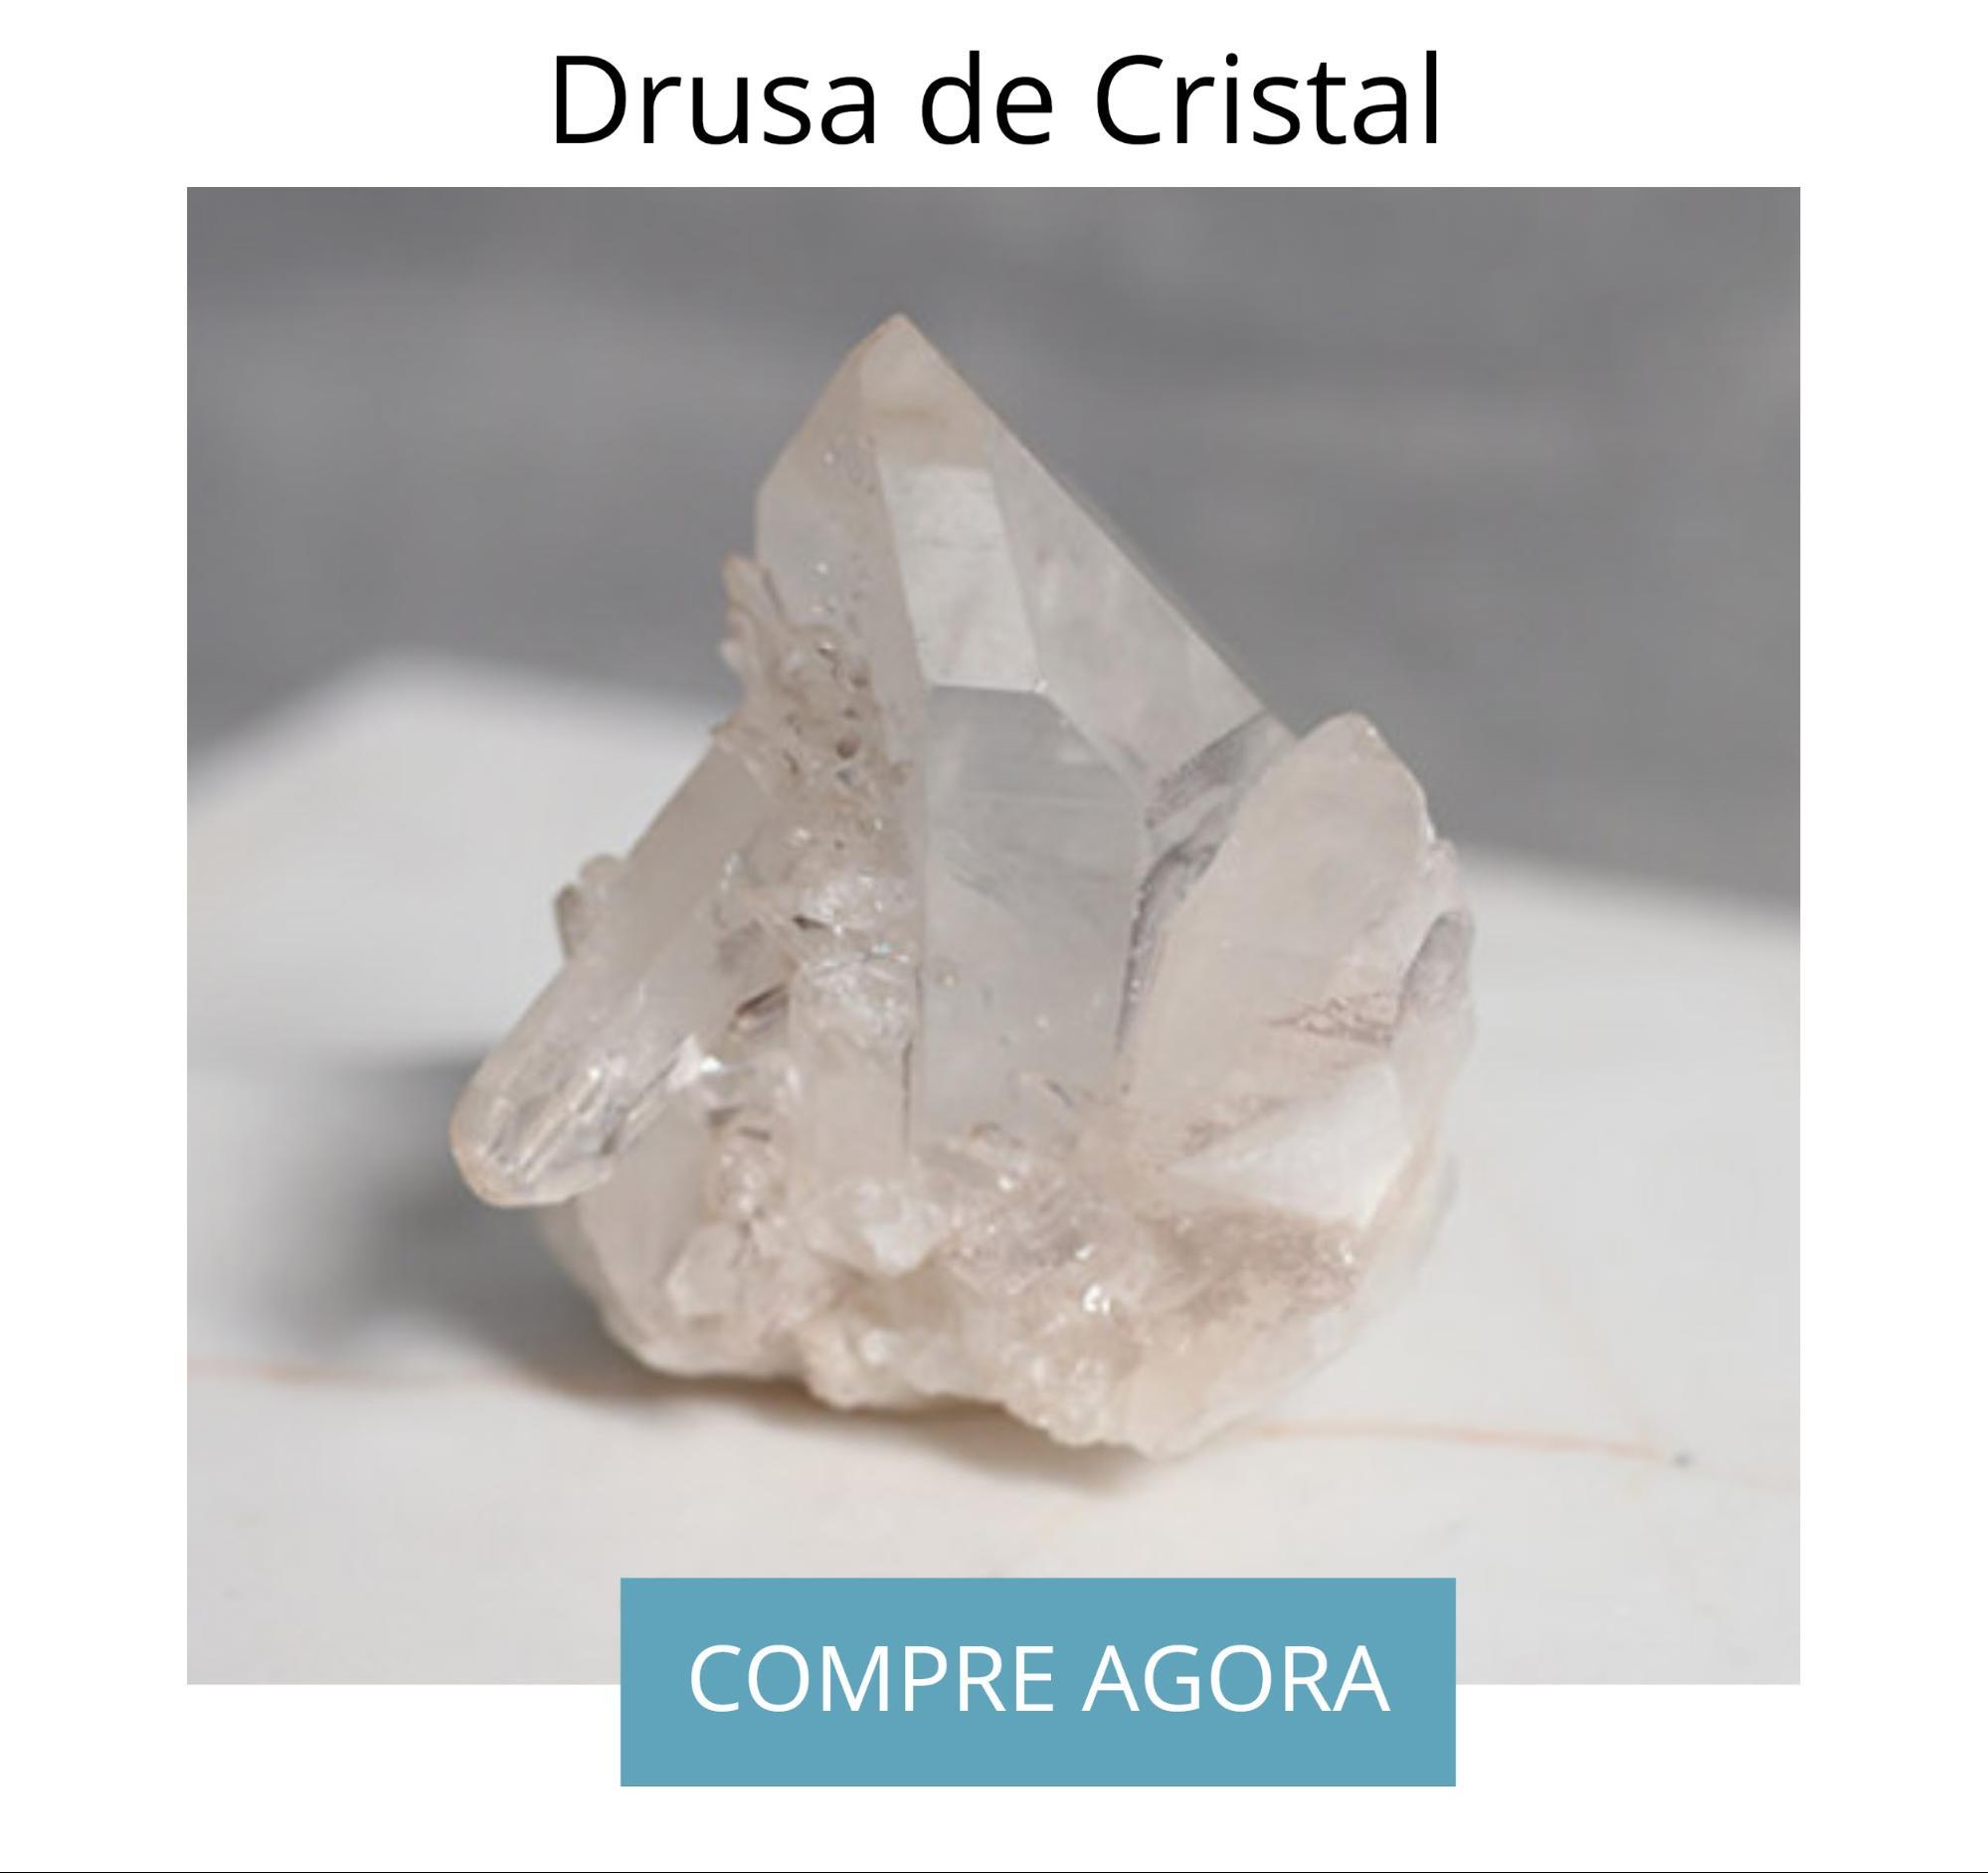 dicas-de-meditacao-drusa-de-cristal